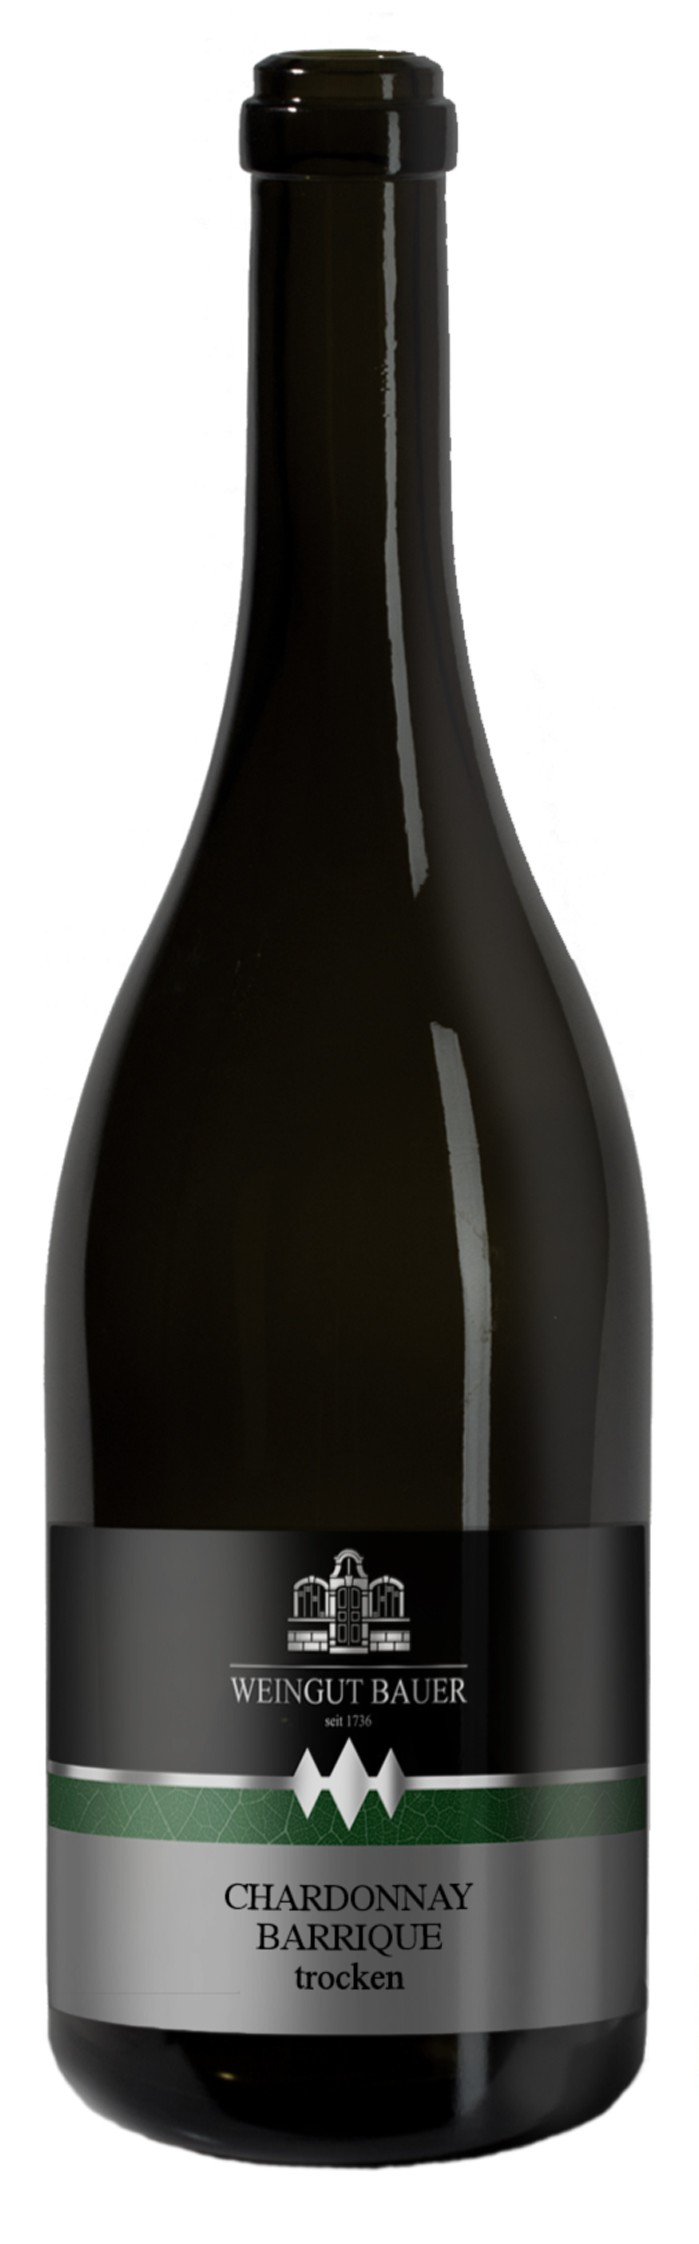 2015 Chardonnay Barrique Kabinett trocken 750ml